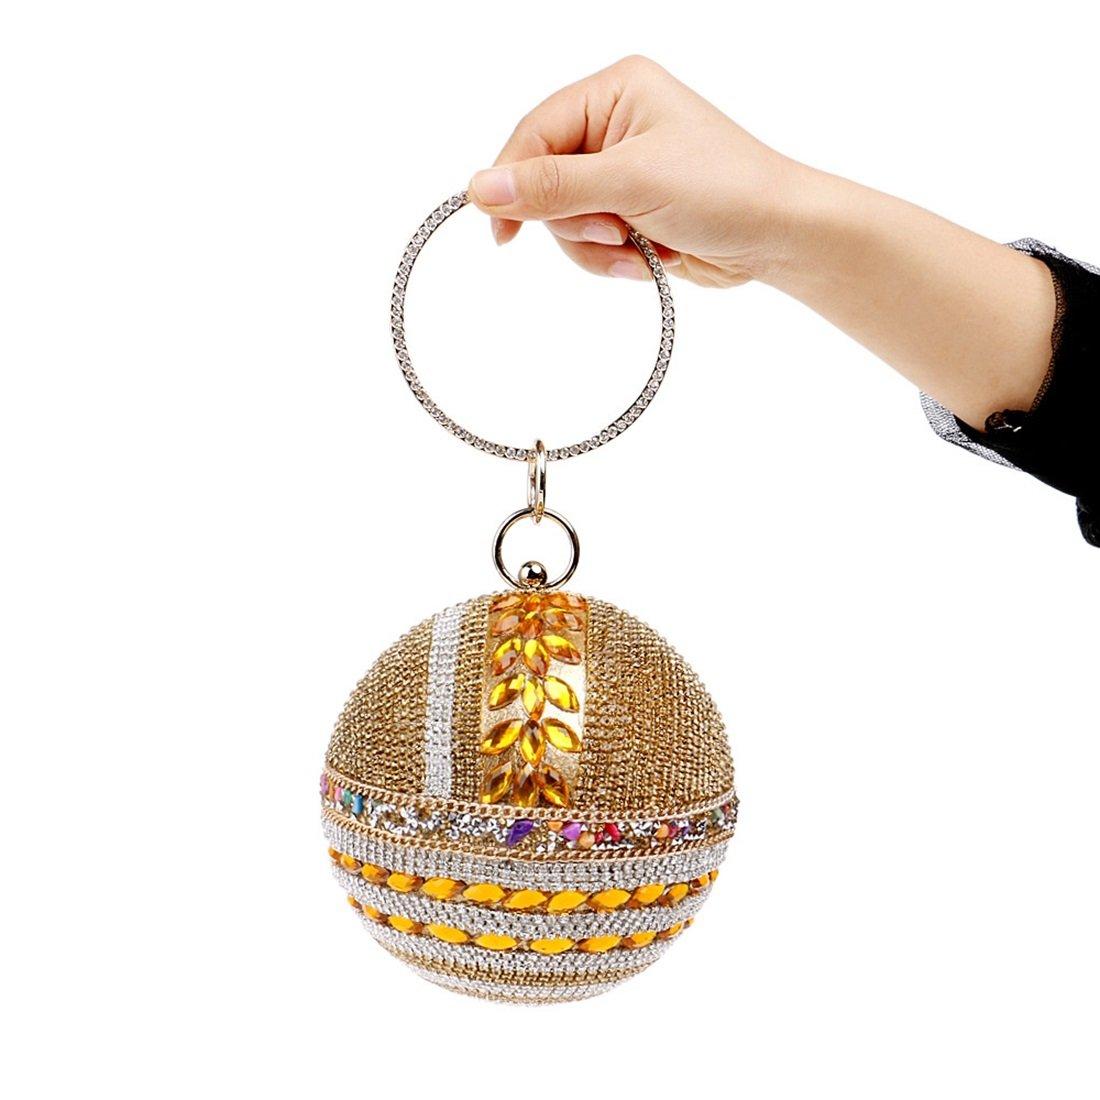 GLJJQMY Wild Evening Bag Exquisite Diamond Banquet Female Bag Lady Trend Handbag Evening Bags Color : Gold